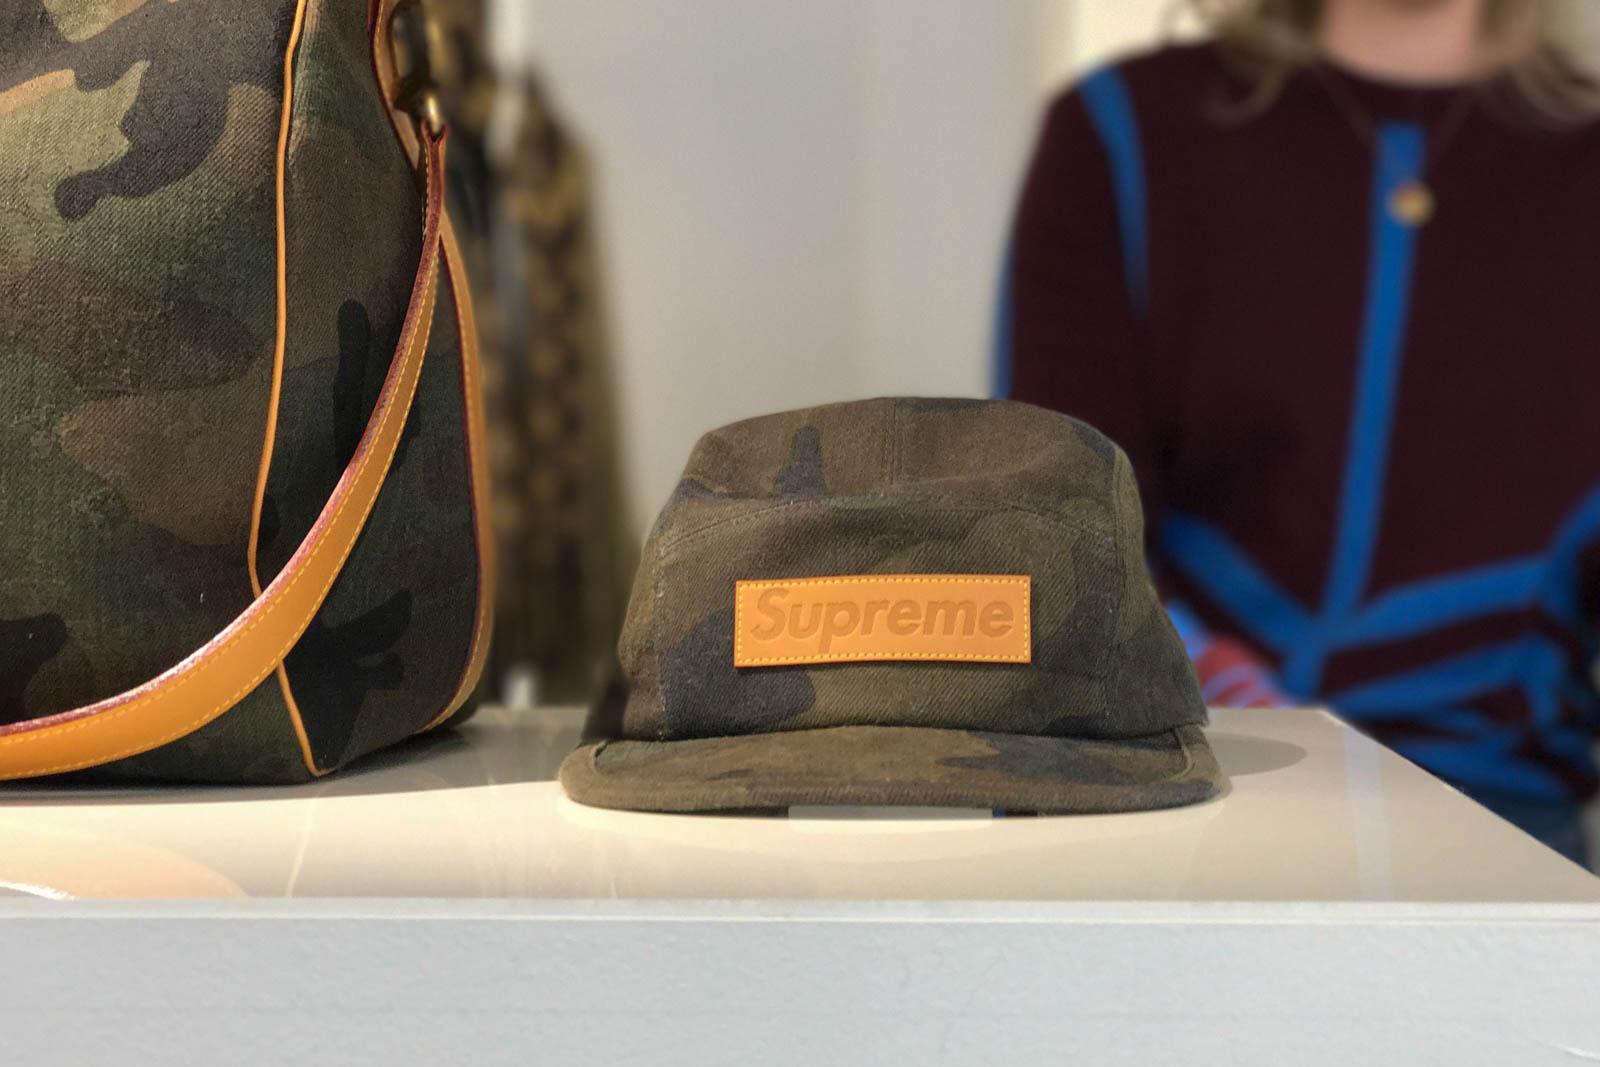 Supreme x Louis Vuitton 2017 Fall/Winter Closer Look Showroom - 3703530